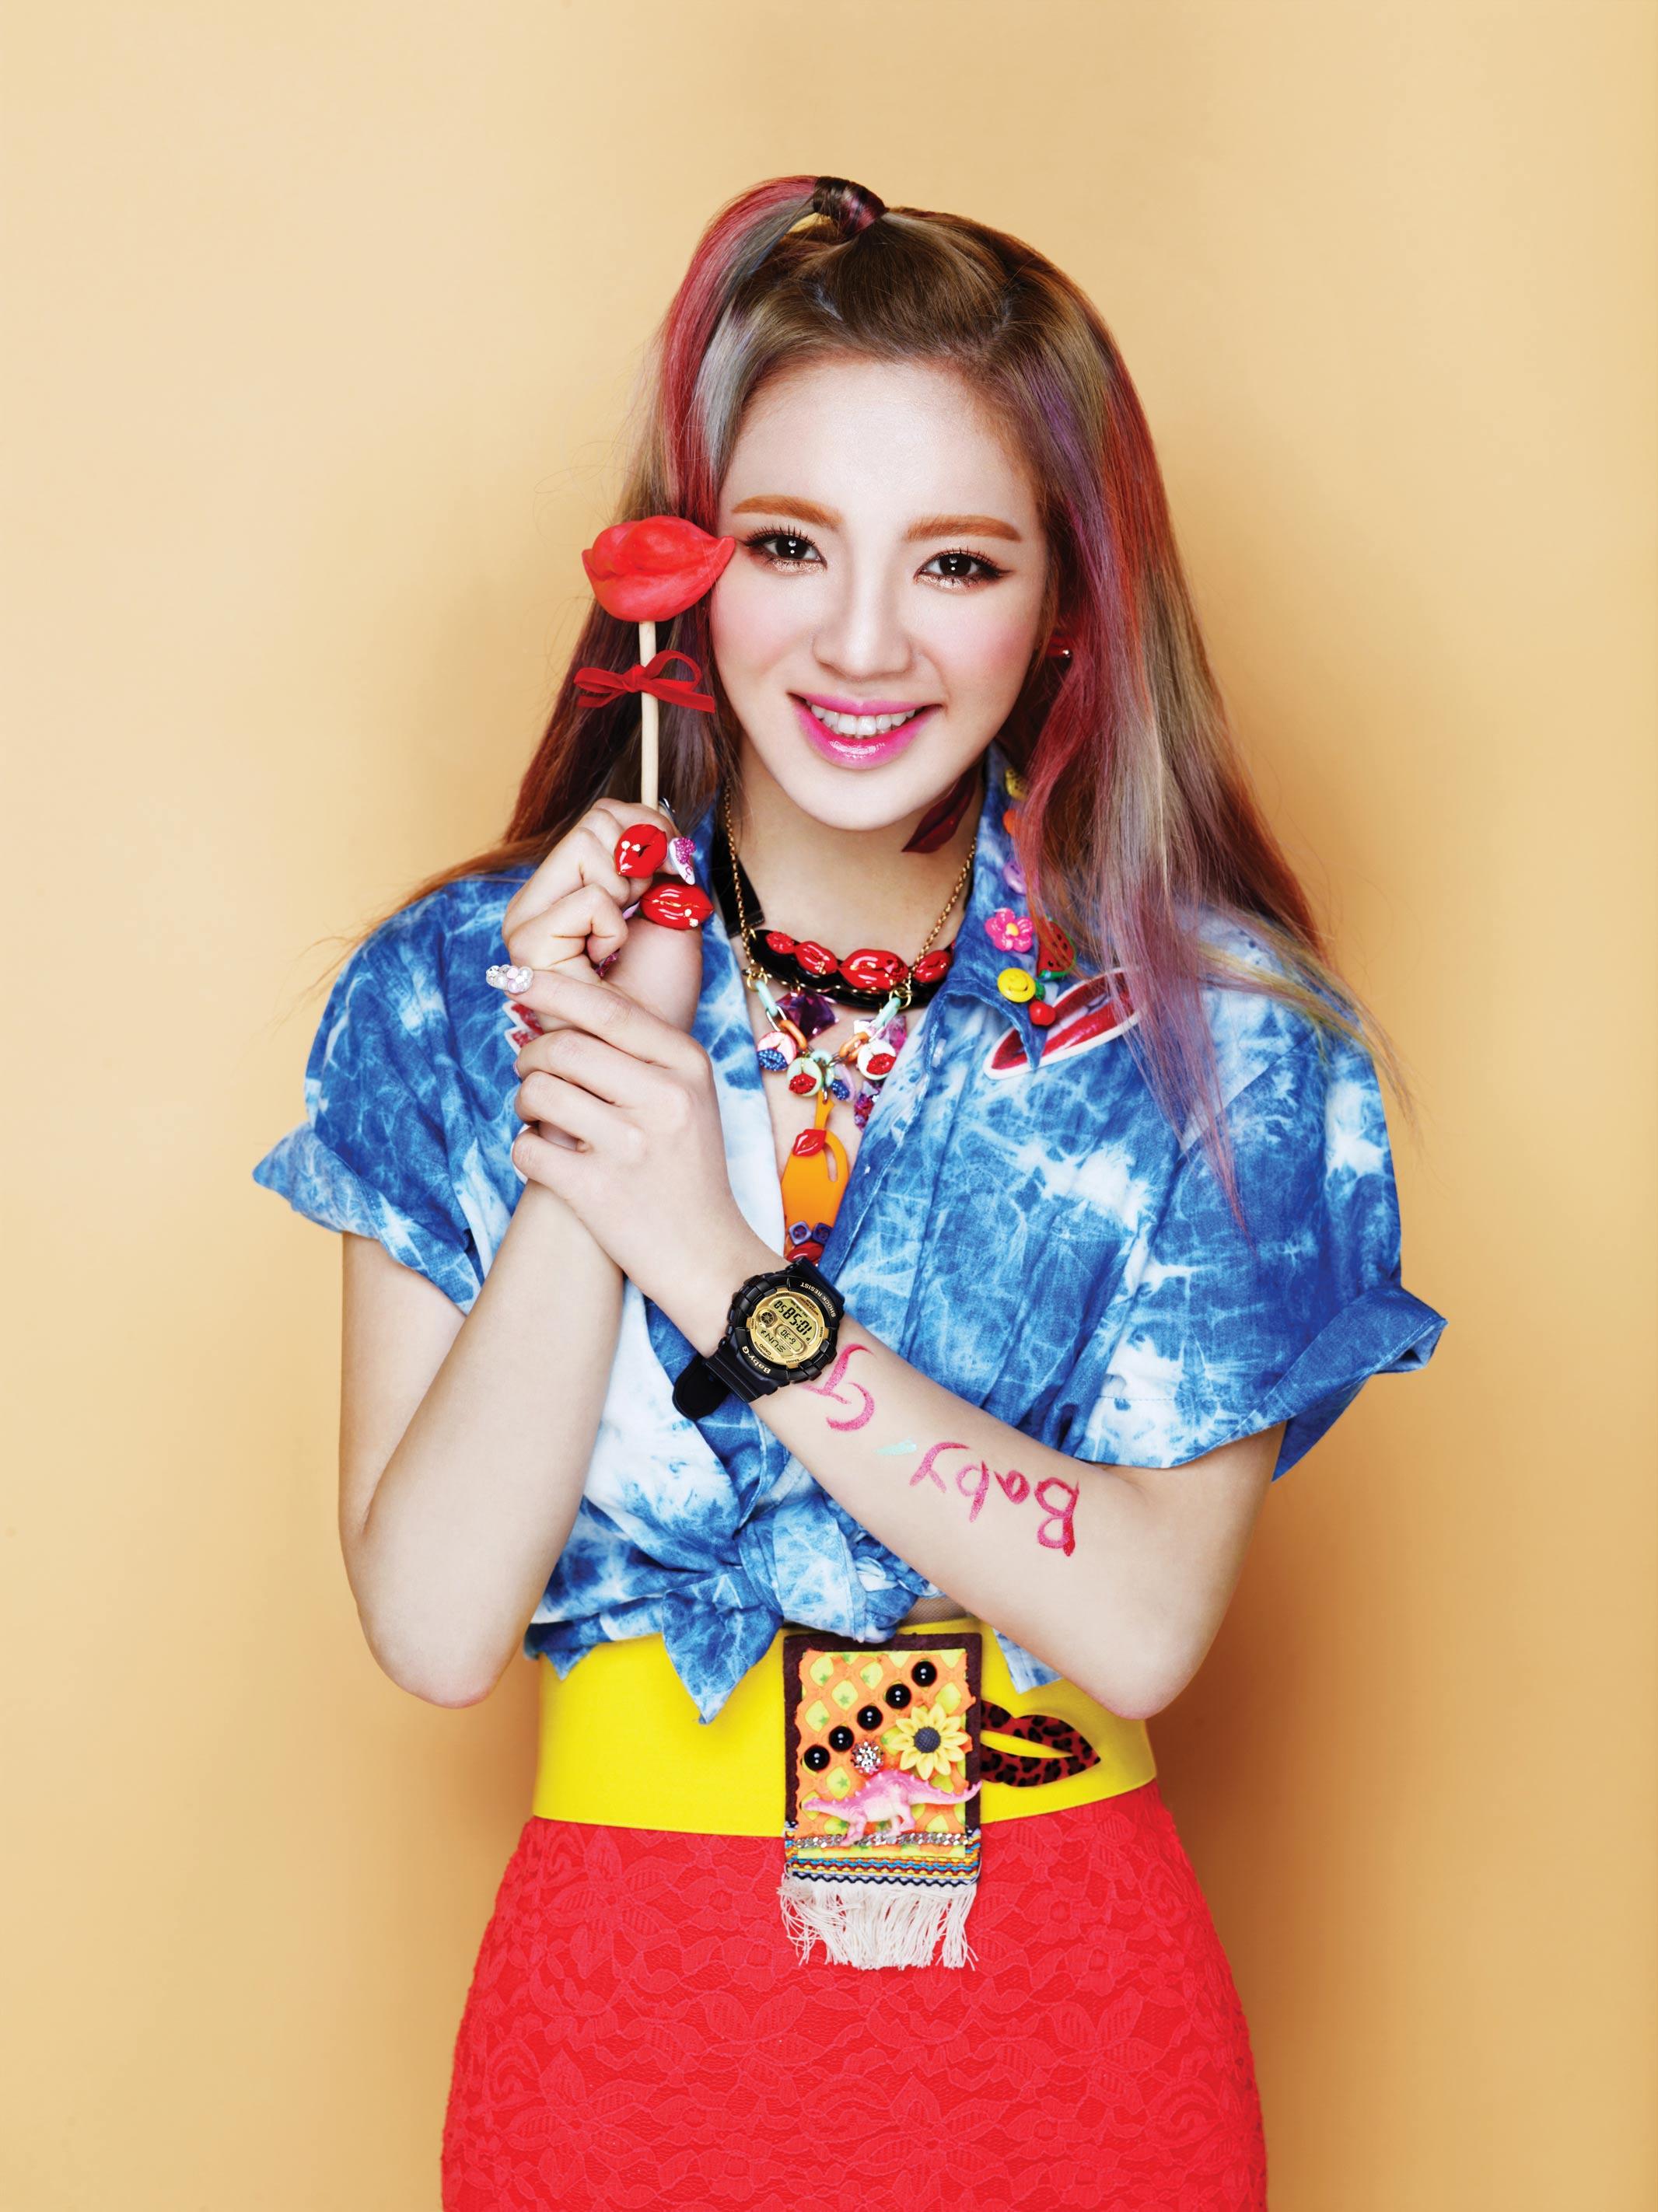 SNSD Hyoyeon Casio Baby-G Kiss Me 2013